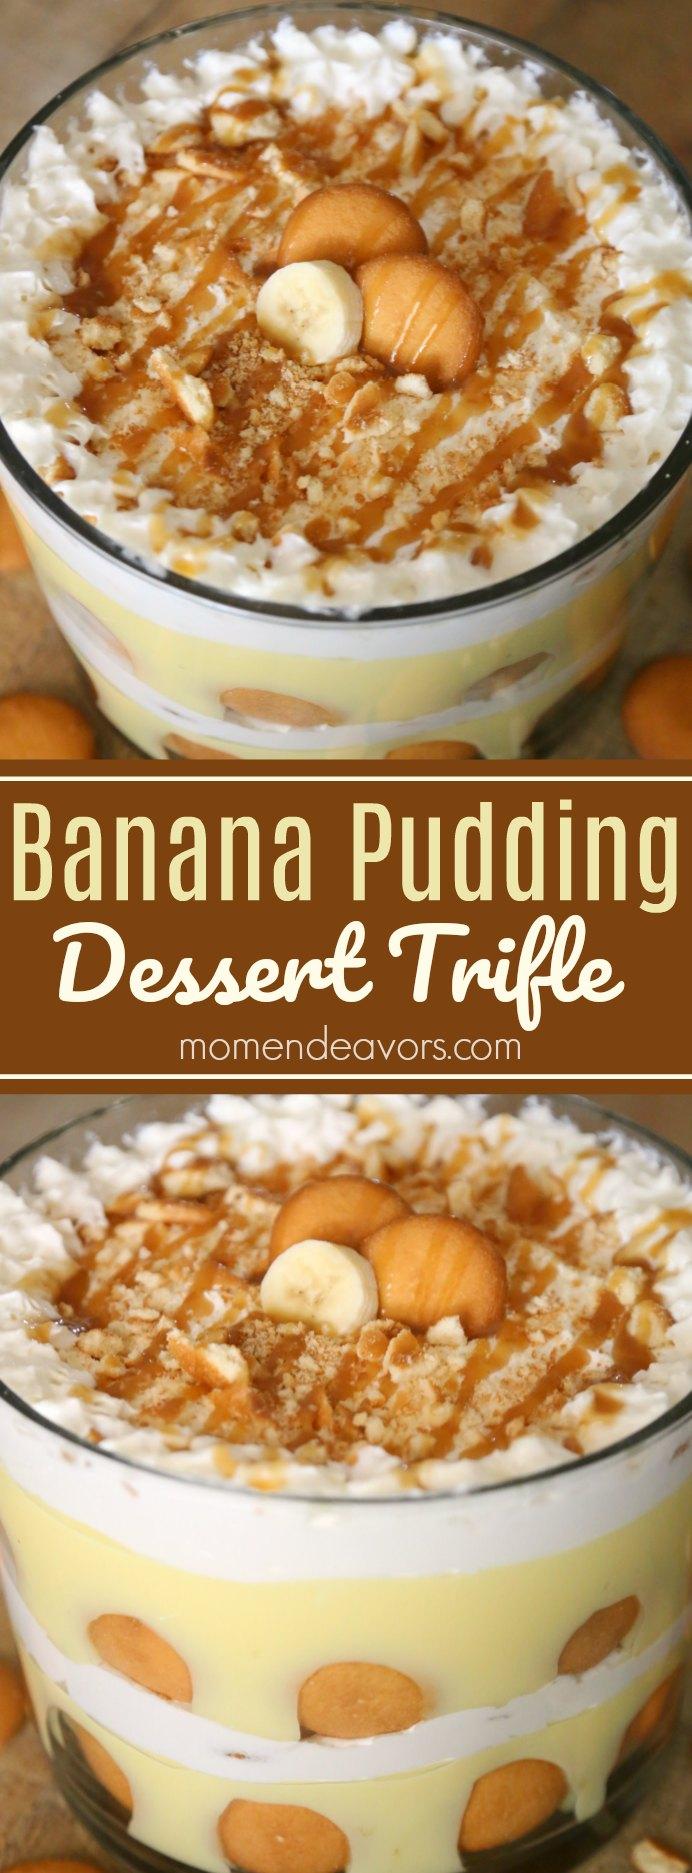 Banana Pudding Trifle Recipe